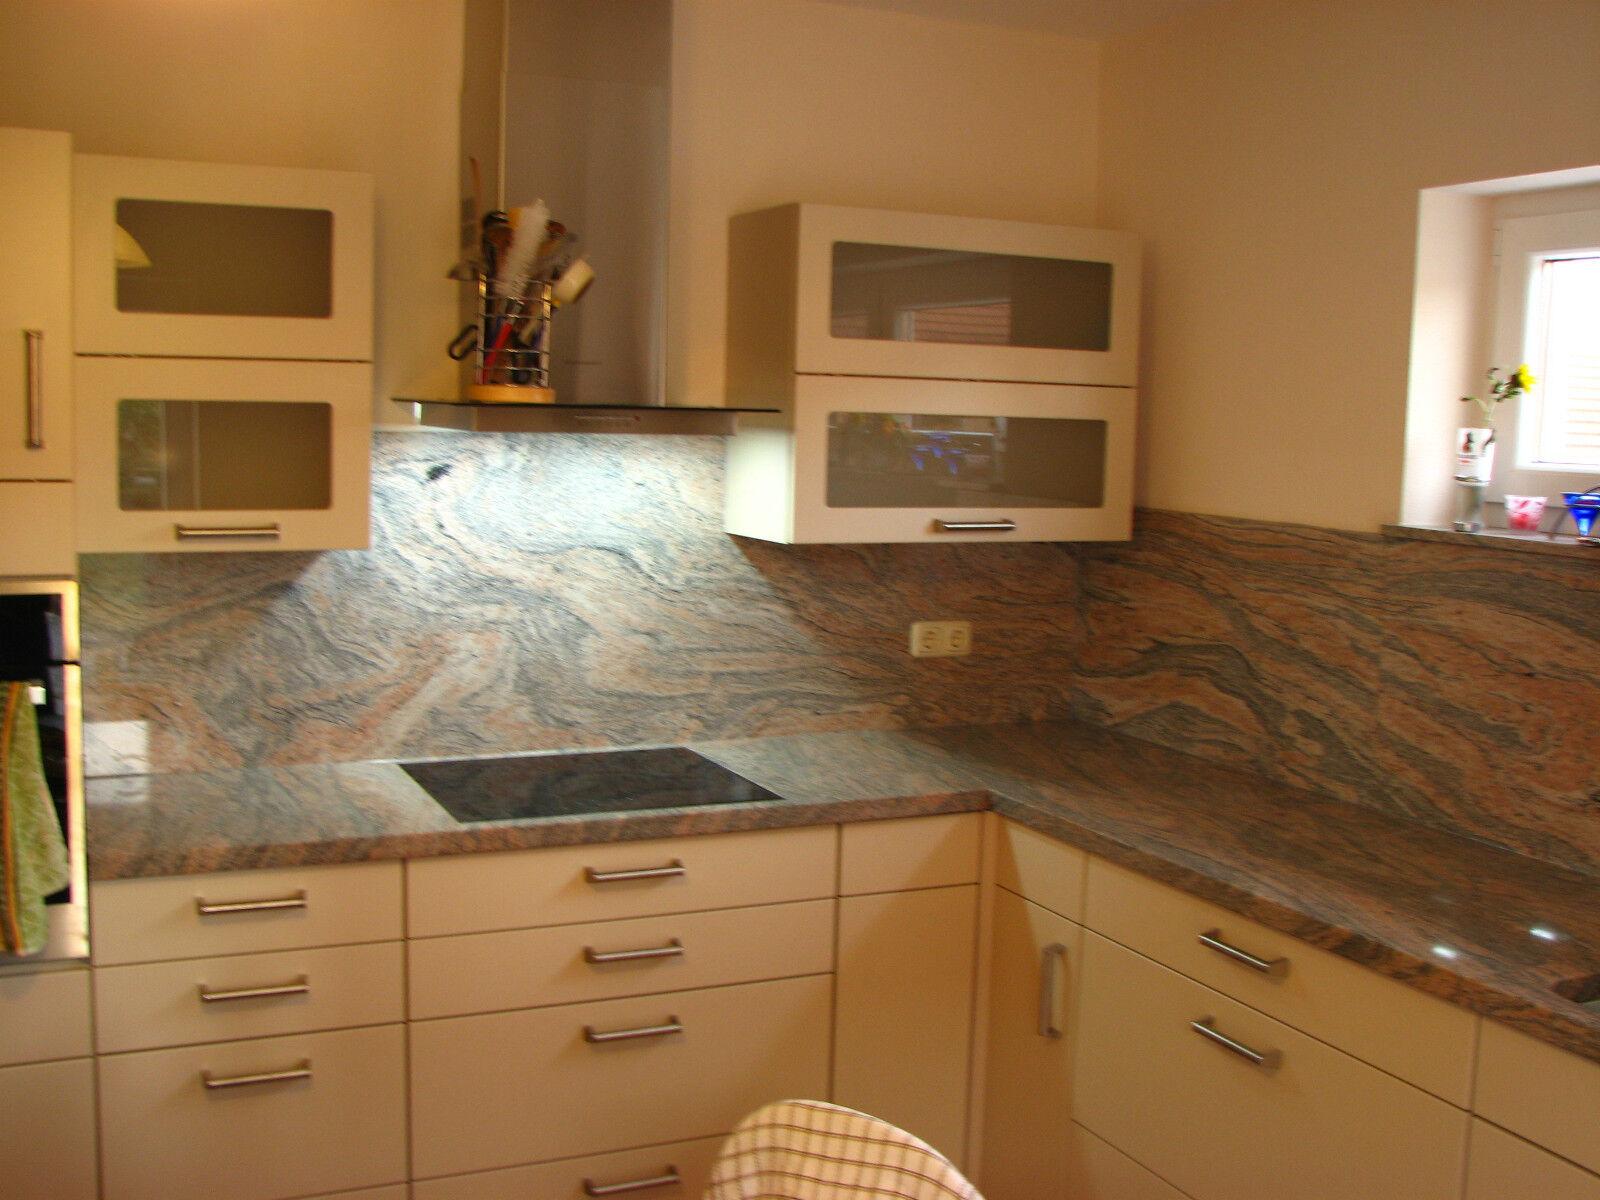 r ckwand k chenarbeitsplatte arbeitsplatte k cheninsel k che granitplatte stein eur 119 00. Black Bedroom Furniture Sets. Home Design Ideas